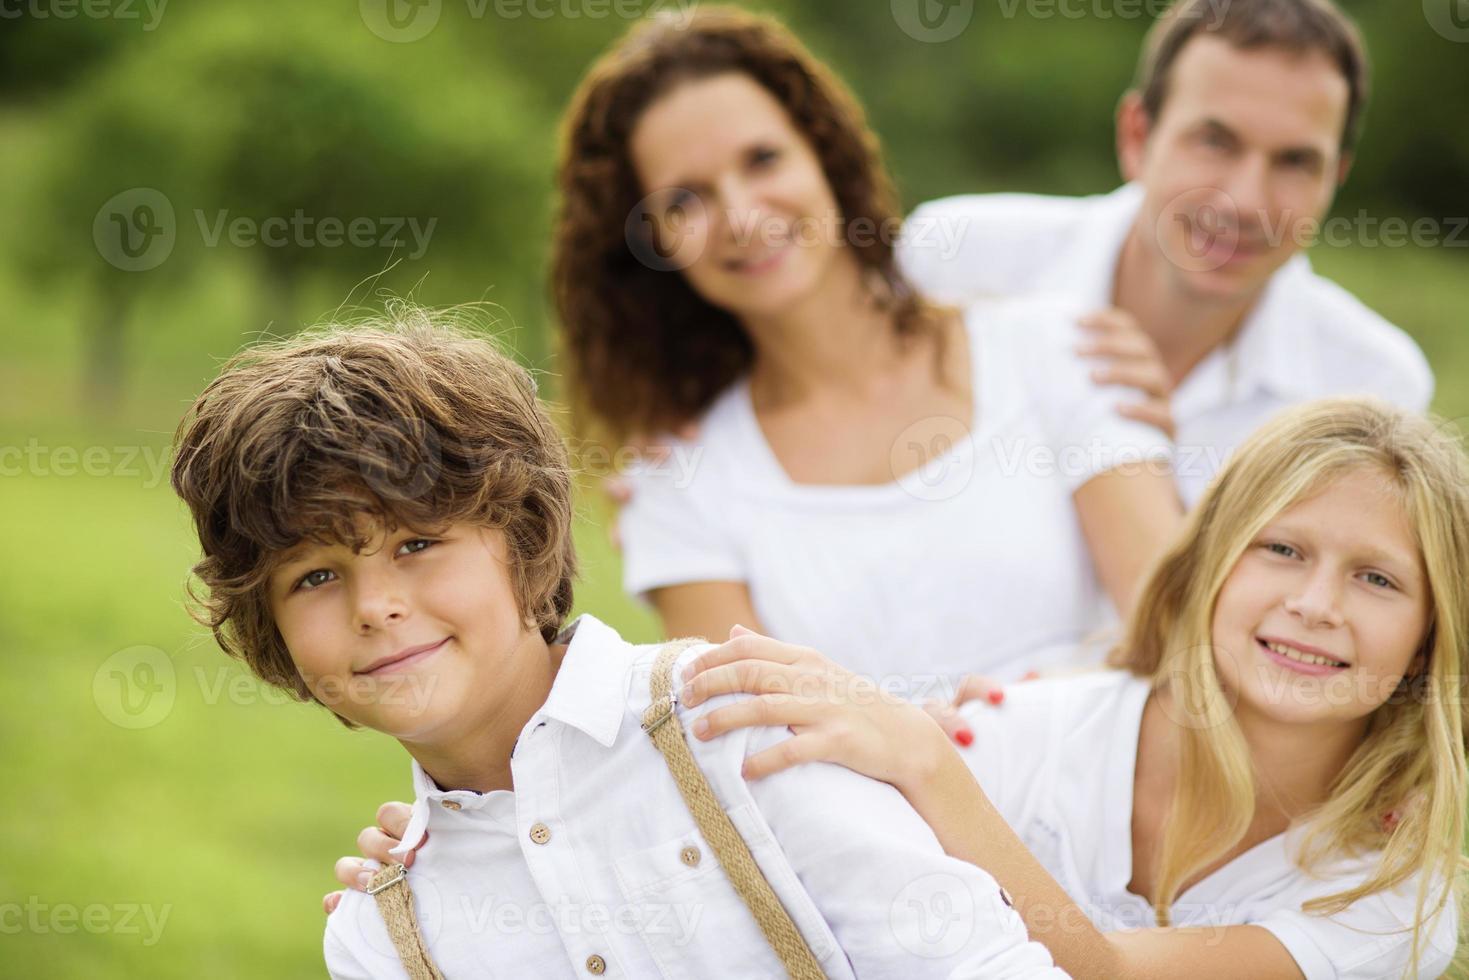 grande família é relaxante na natureza verde foto